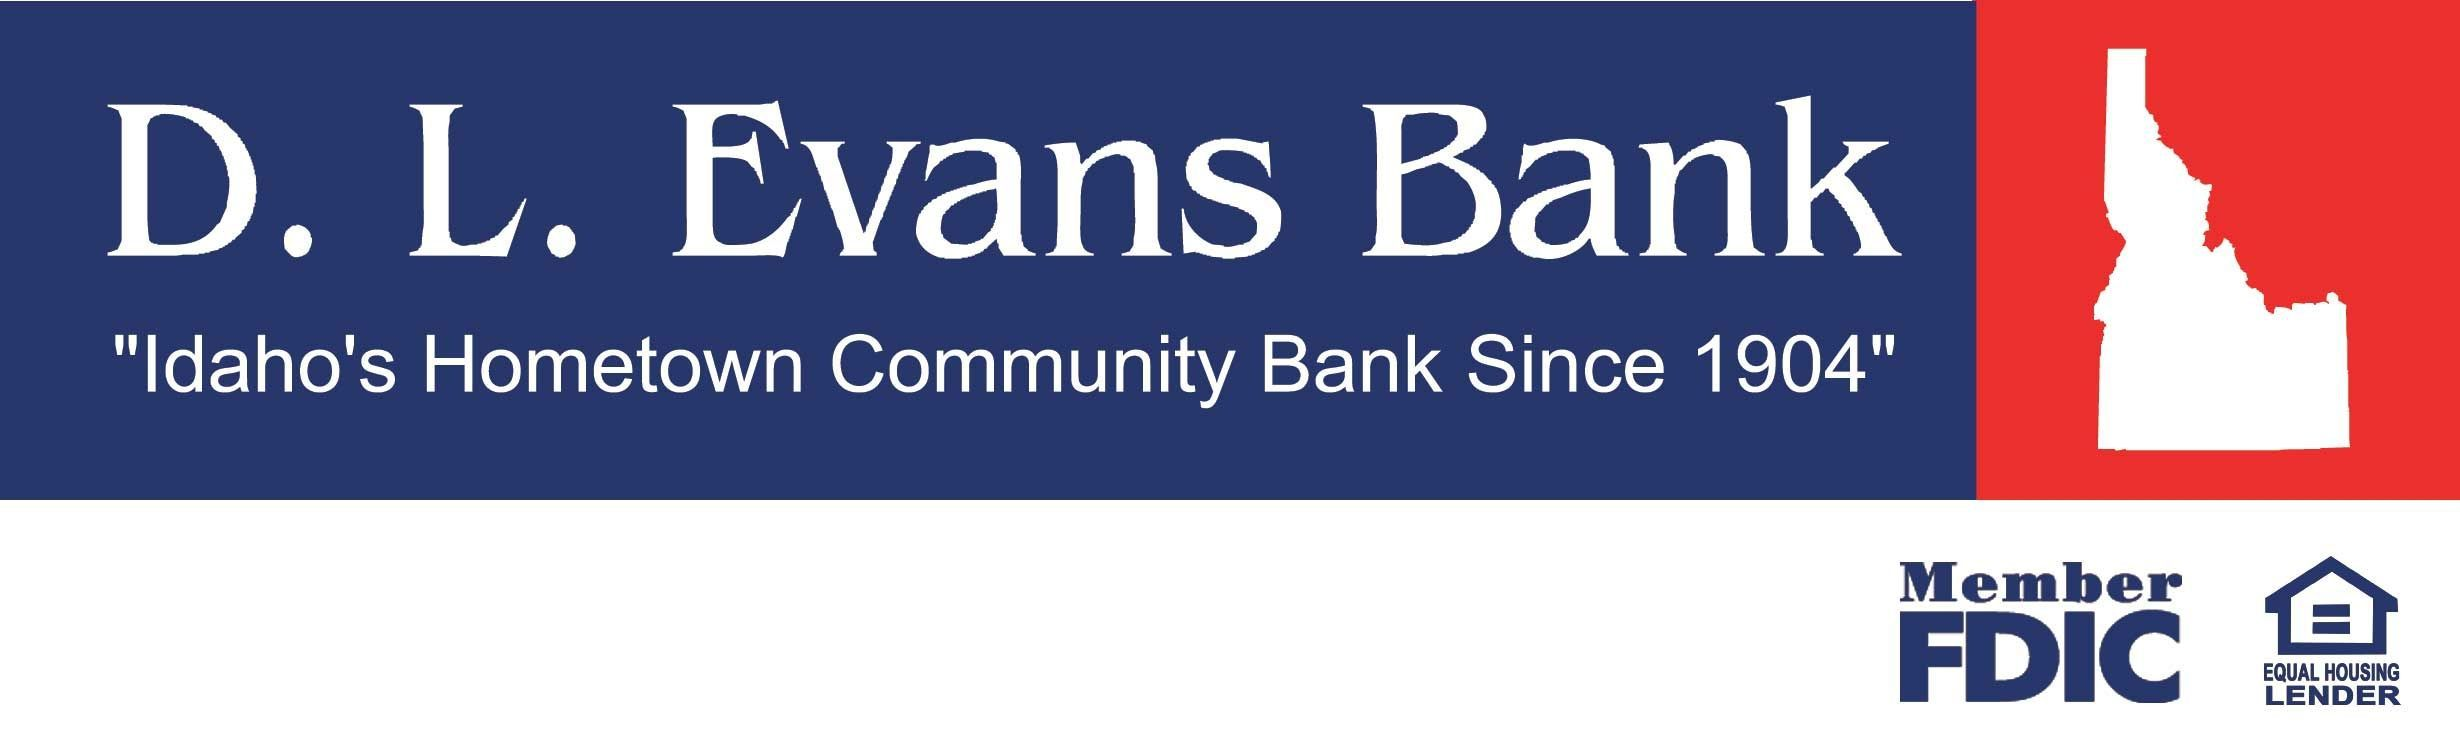 D.L. Evans Bank logo